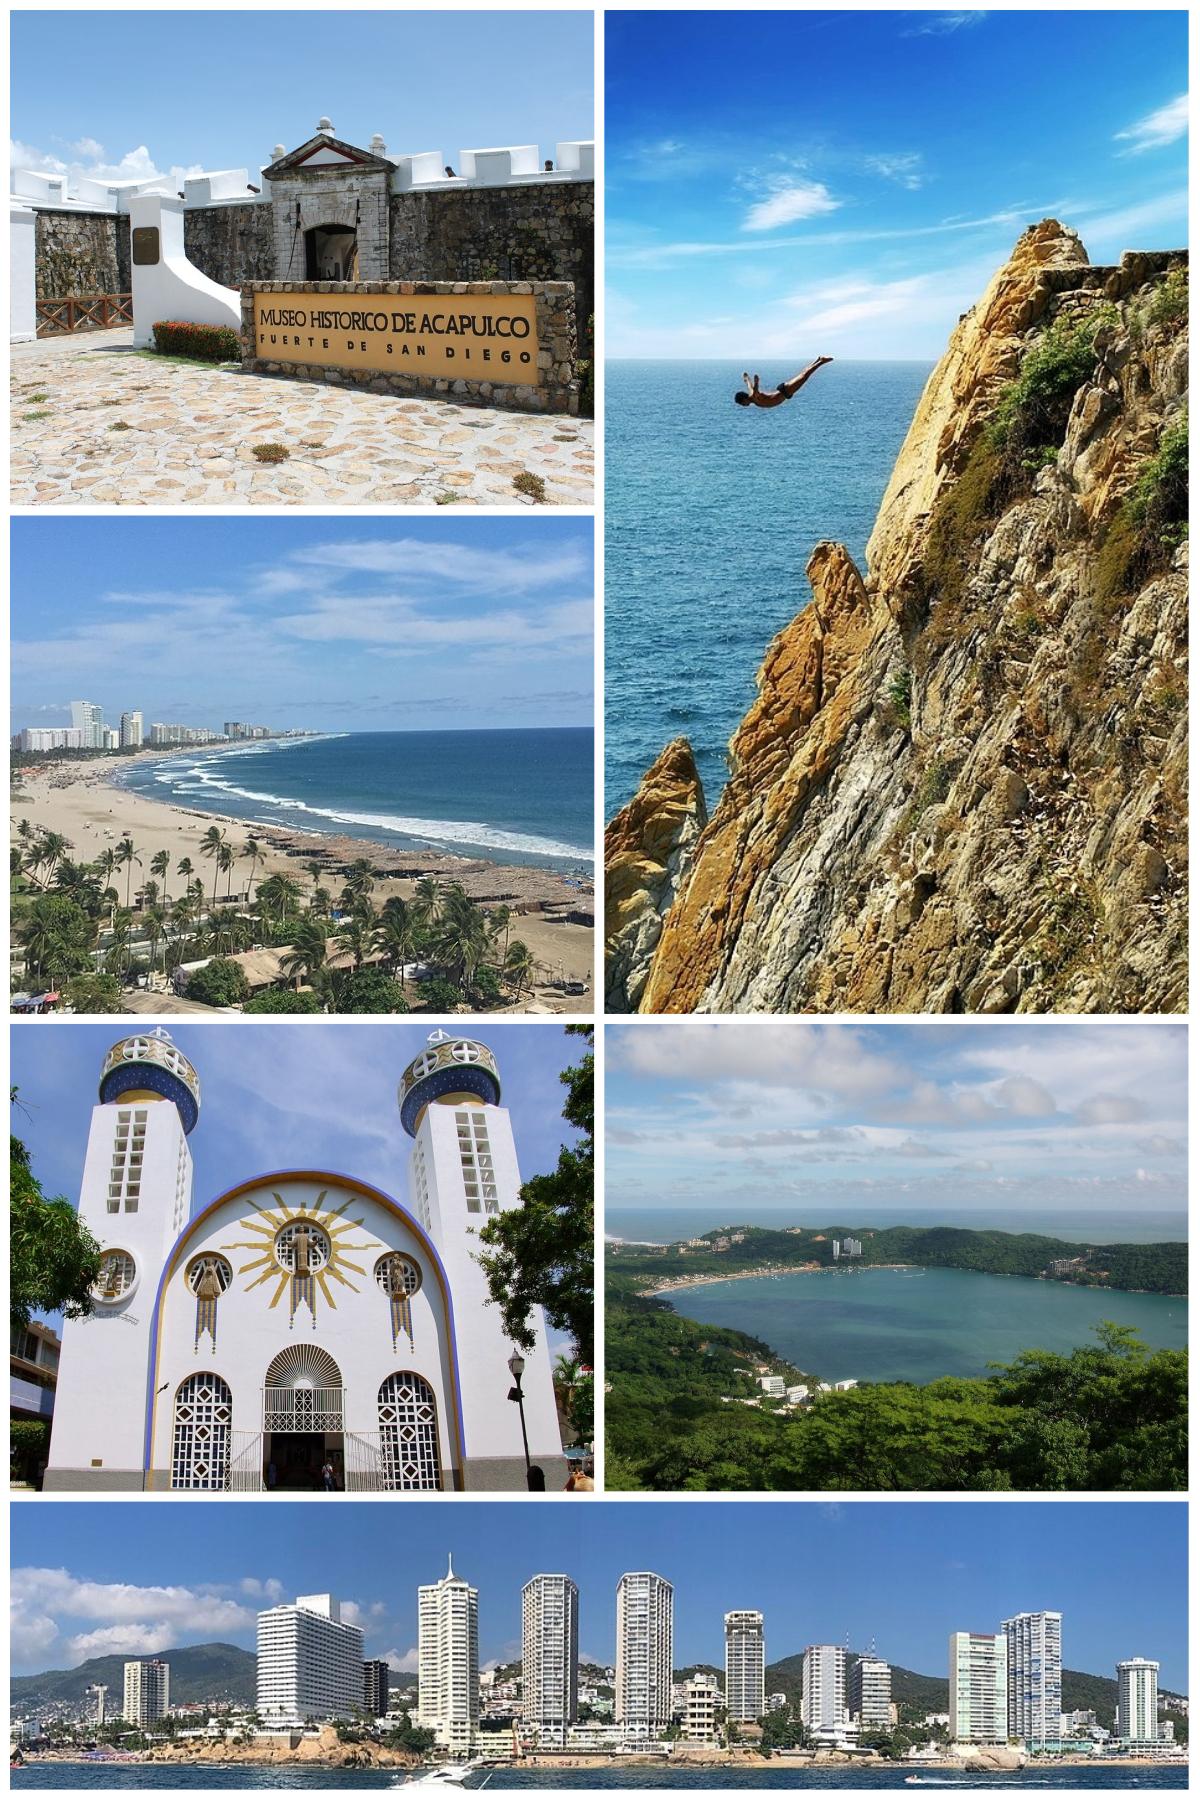 Acapulco - Wikipedia